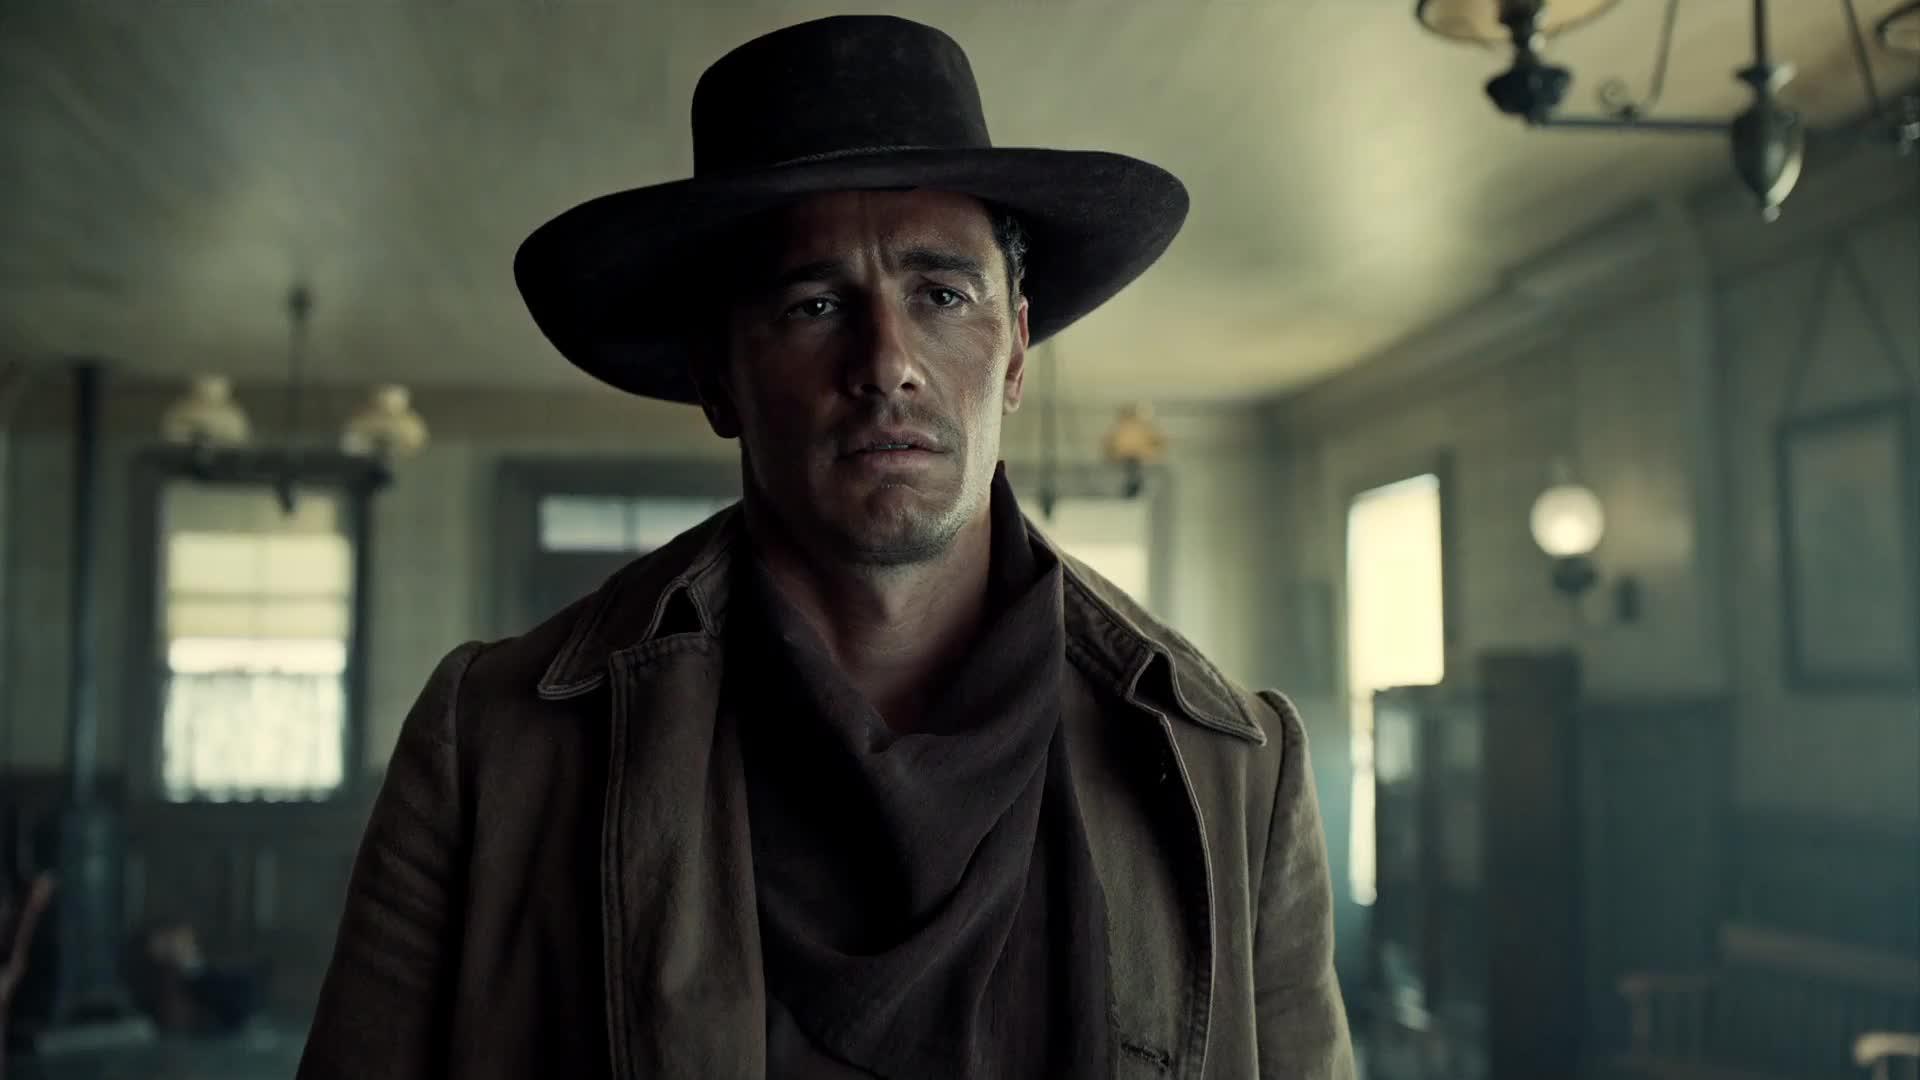 James Franco, sigh, the ballad of buster scruggs, cowboy sigh GIFs